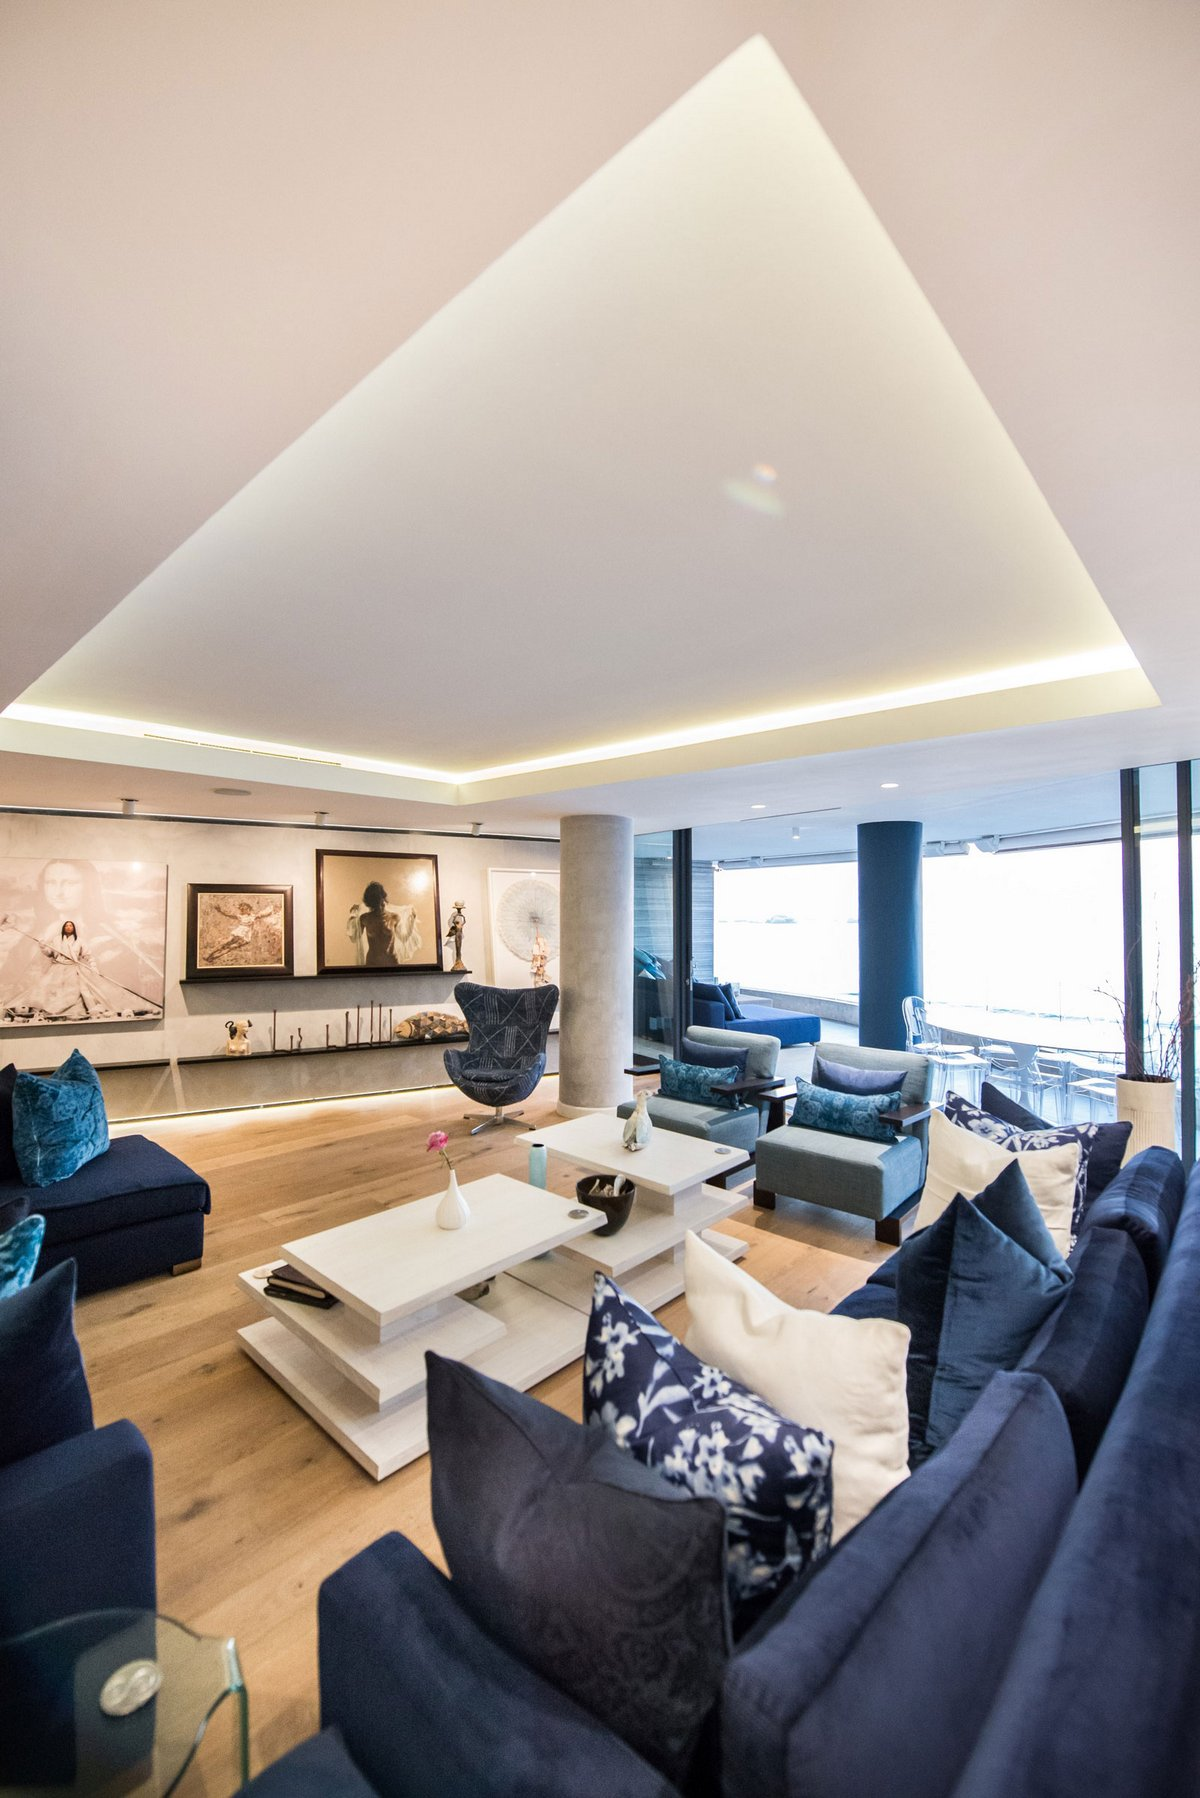 Элитная квартира в Кейптауне